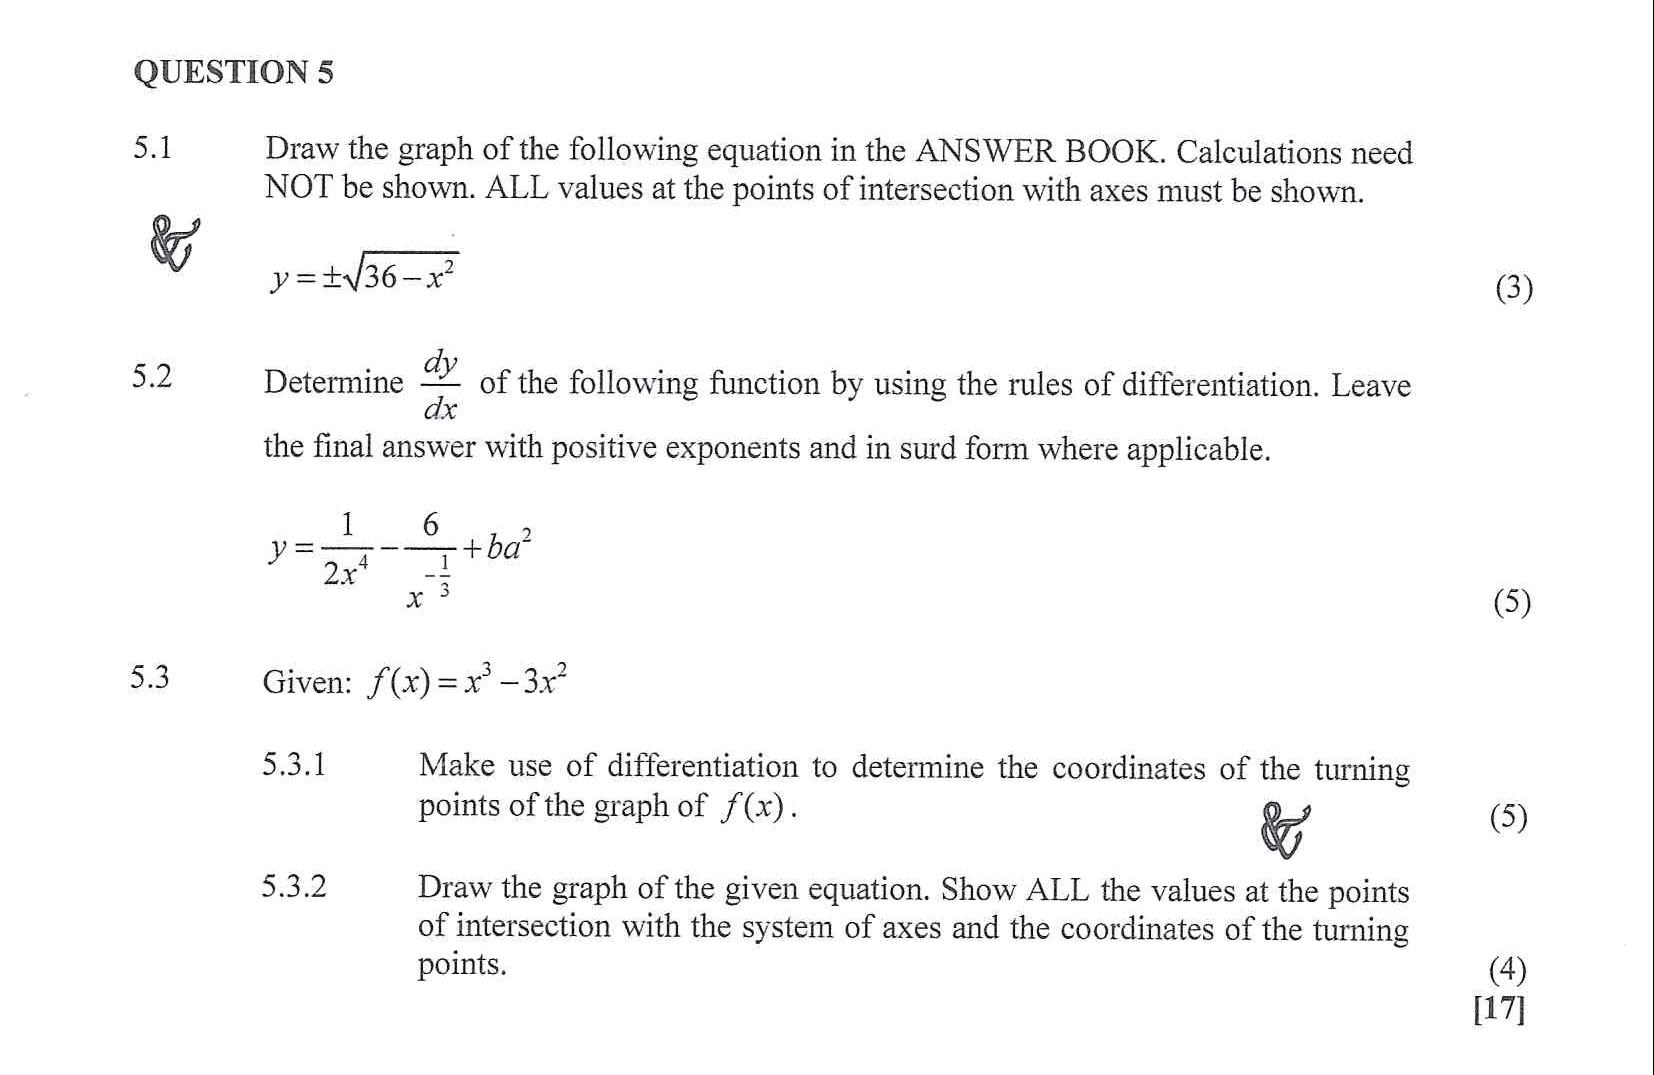 Mathematics N3 2020 April exam Question 5